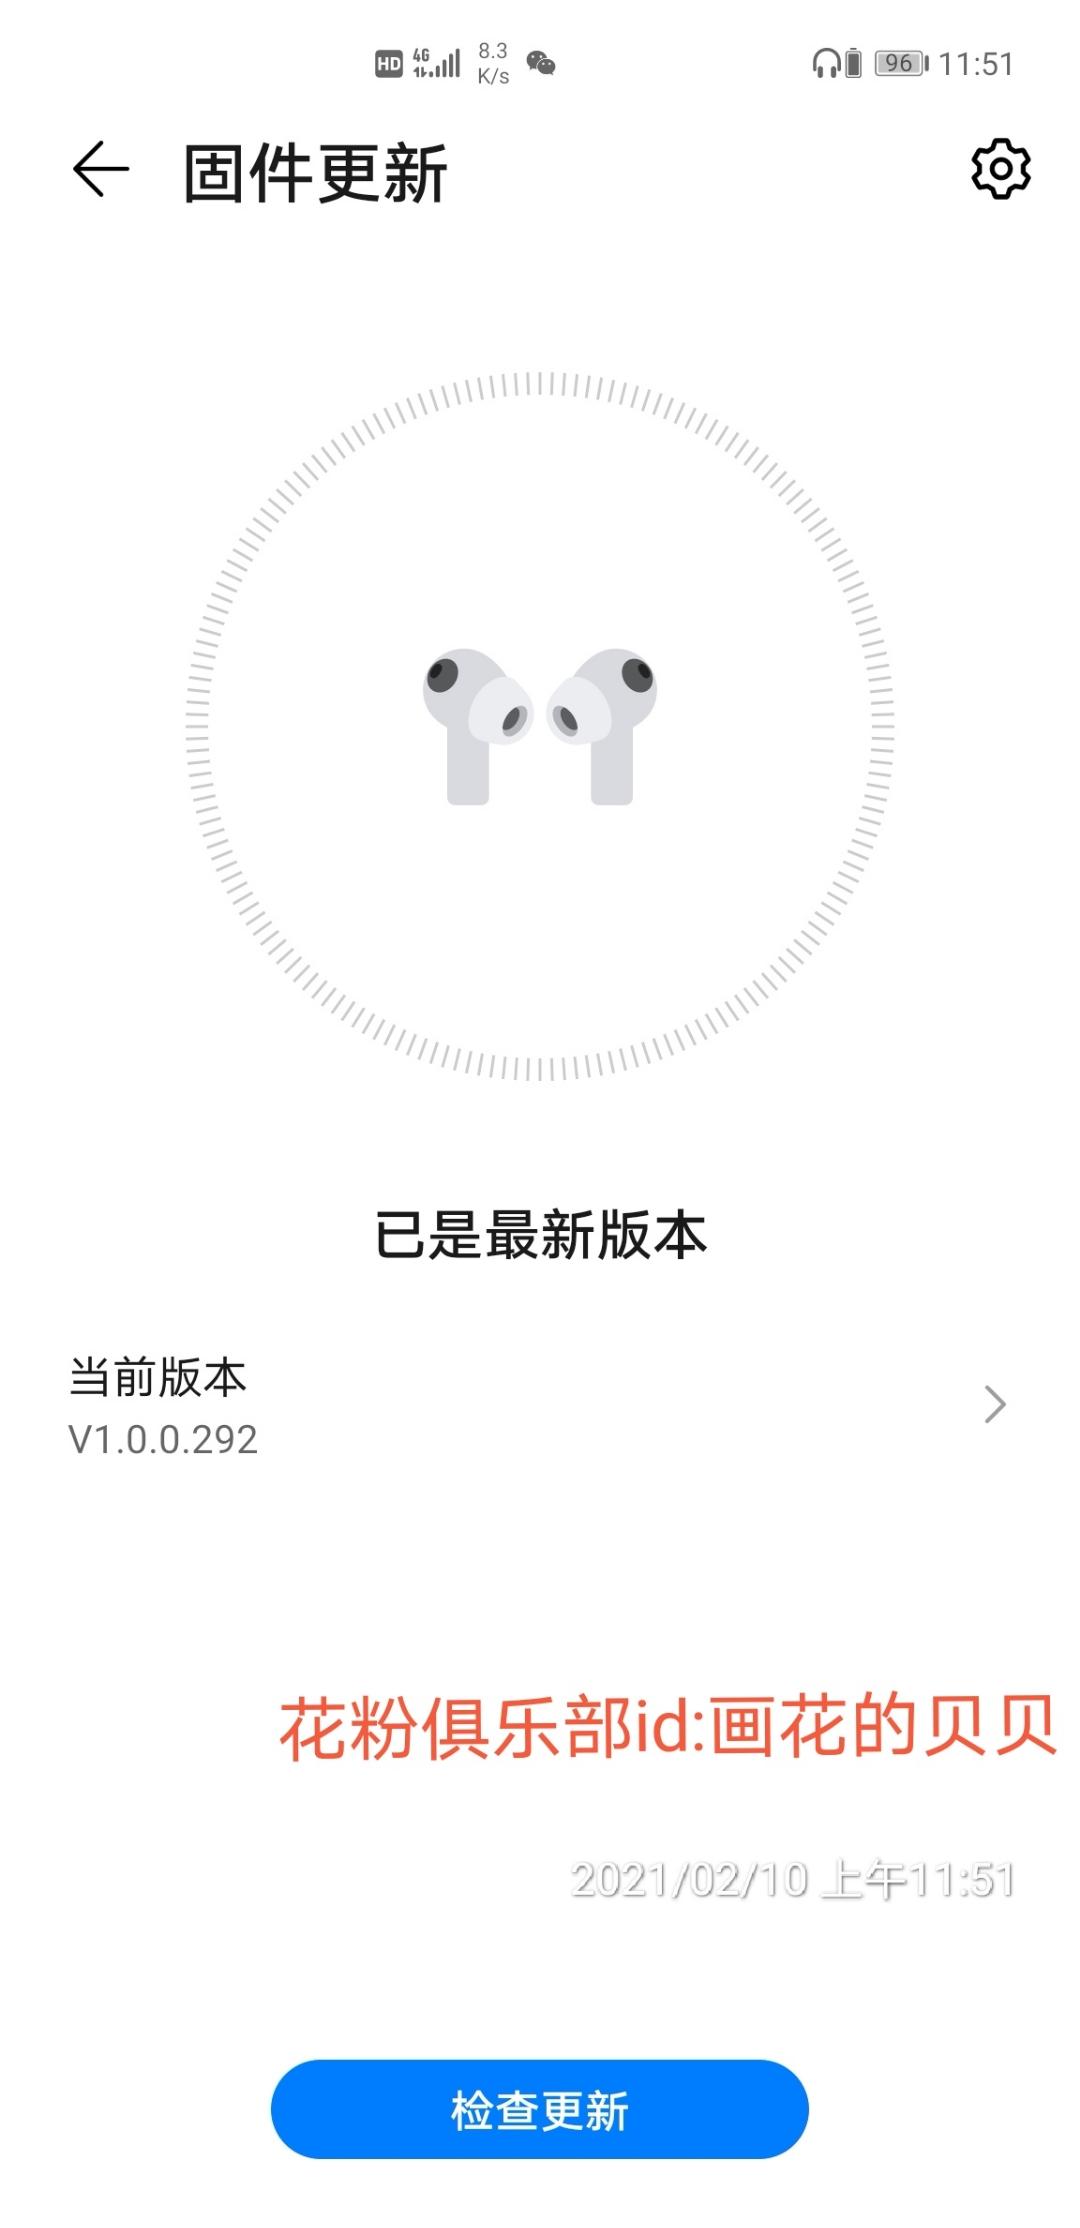 Screenshot_20210210_115142_com.huawei.smarthome_edit_418316955463252.jpg